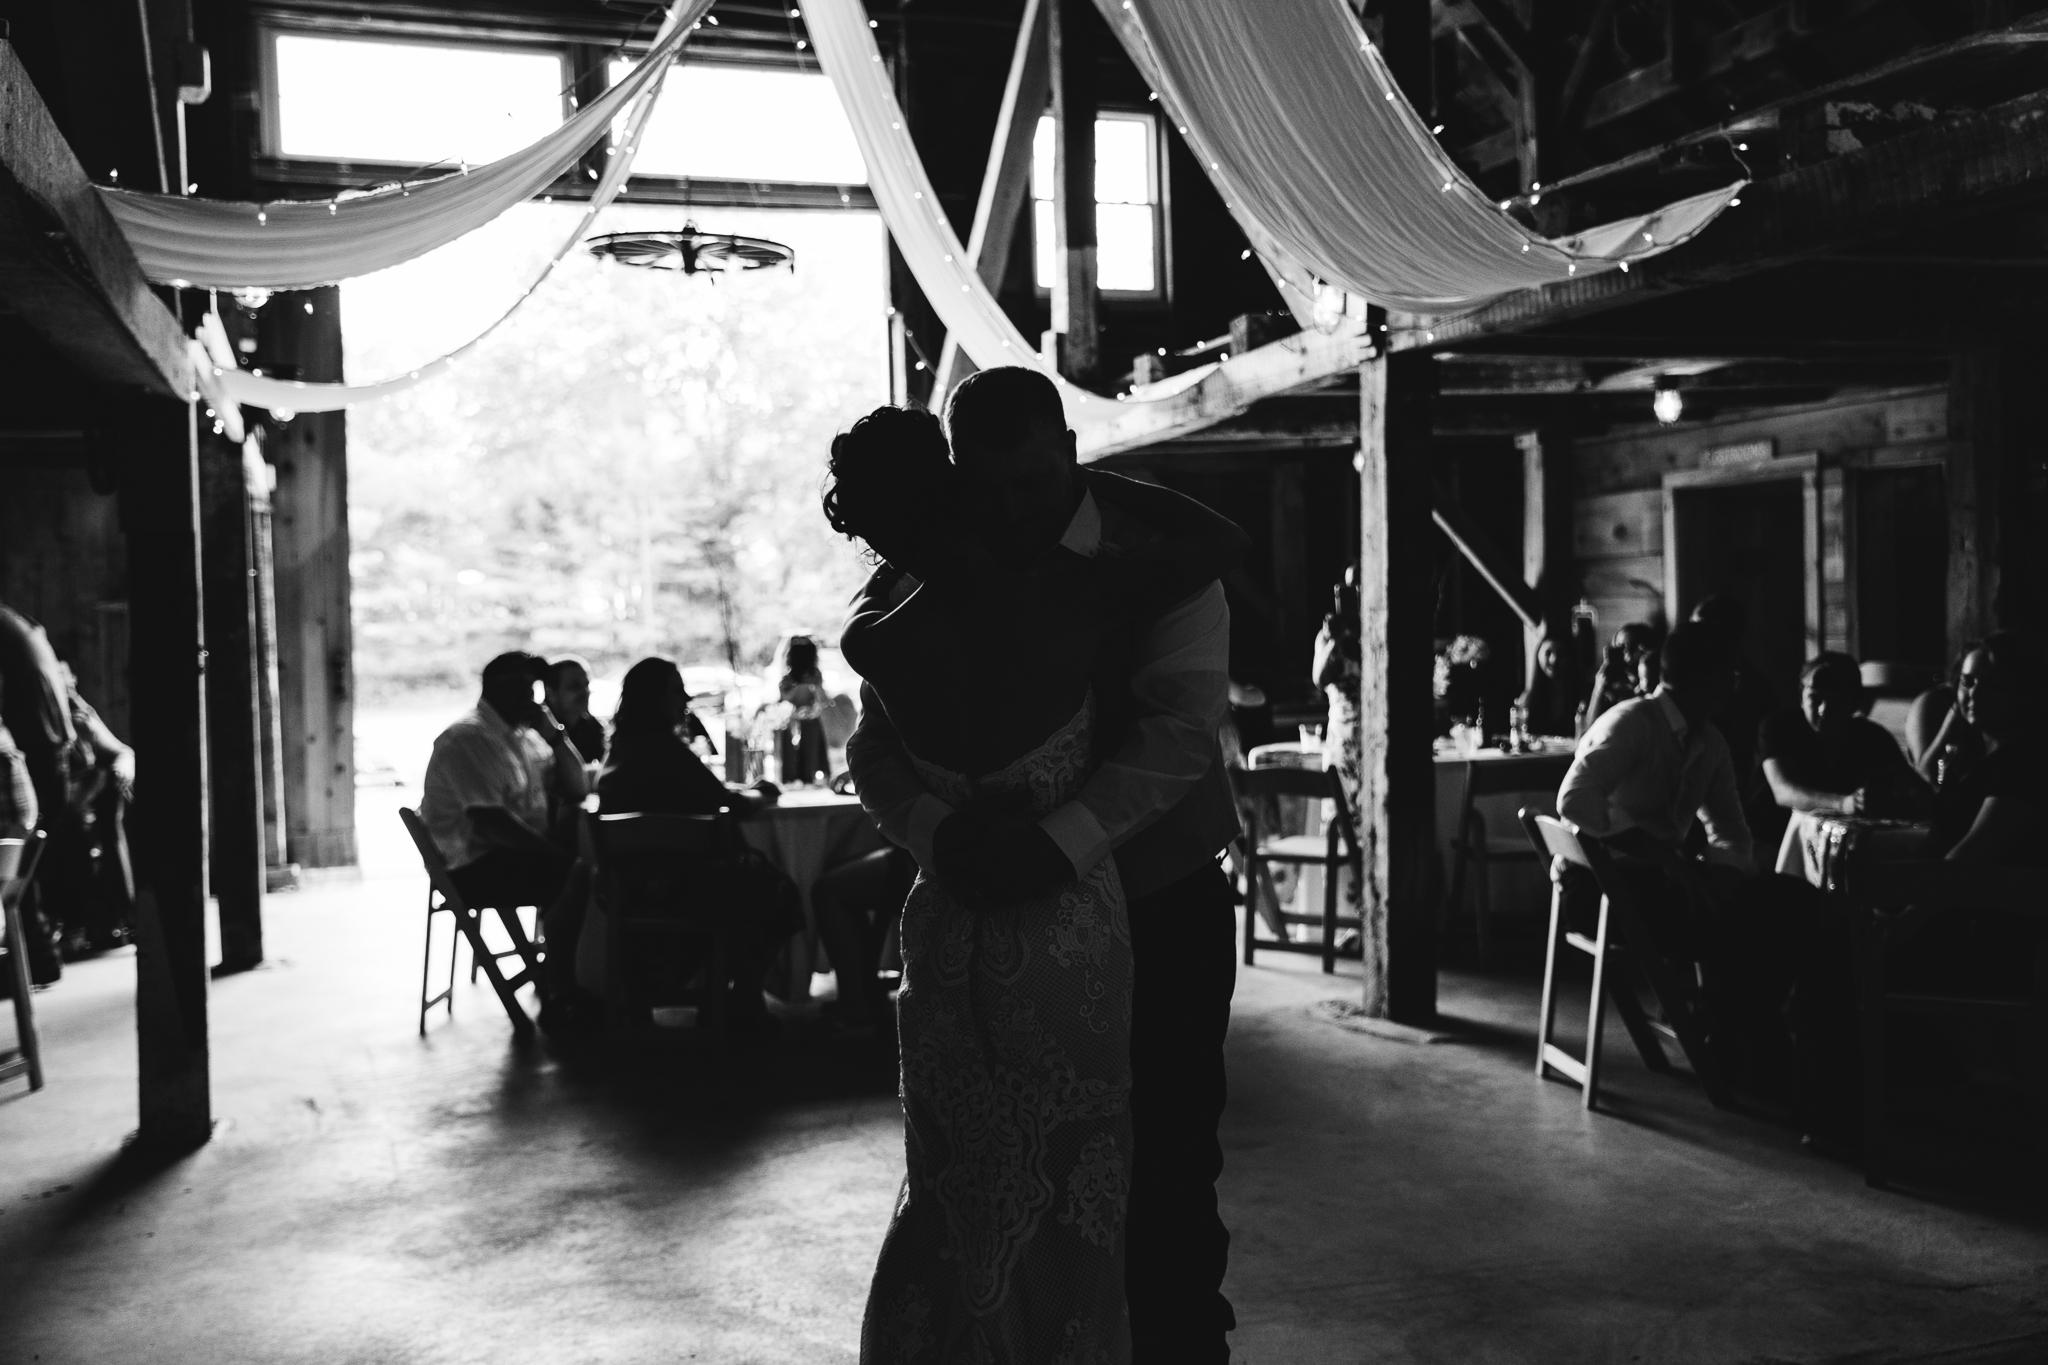 maine-wedding-first-dance-husband-wife-bride-groom-barn-black-and-white.jpg